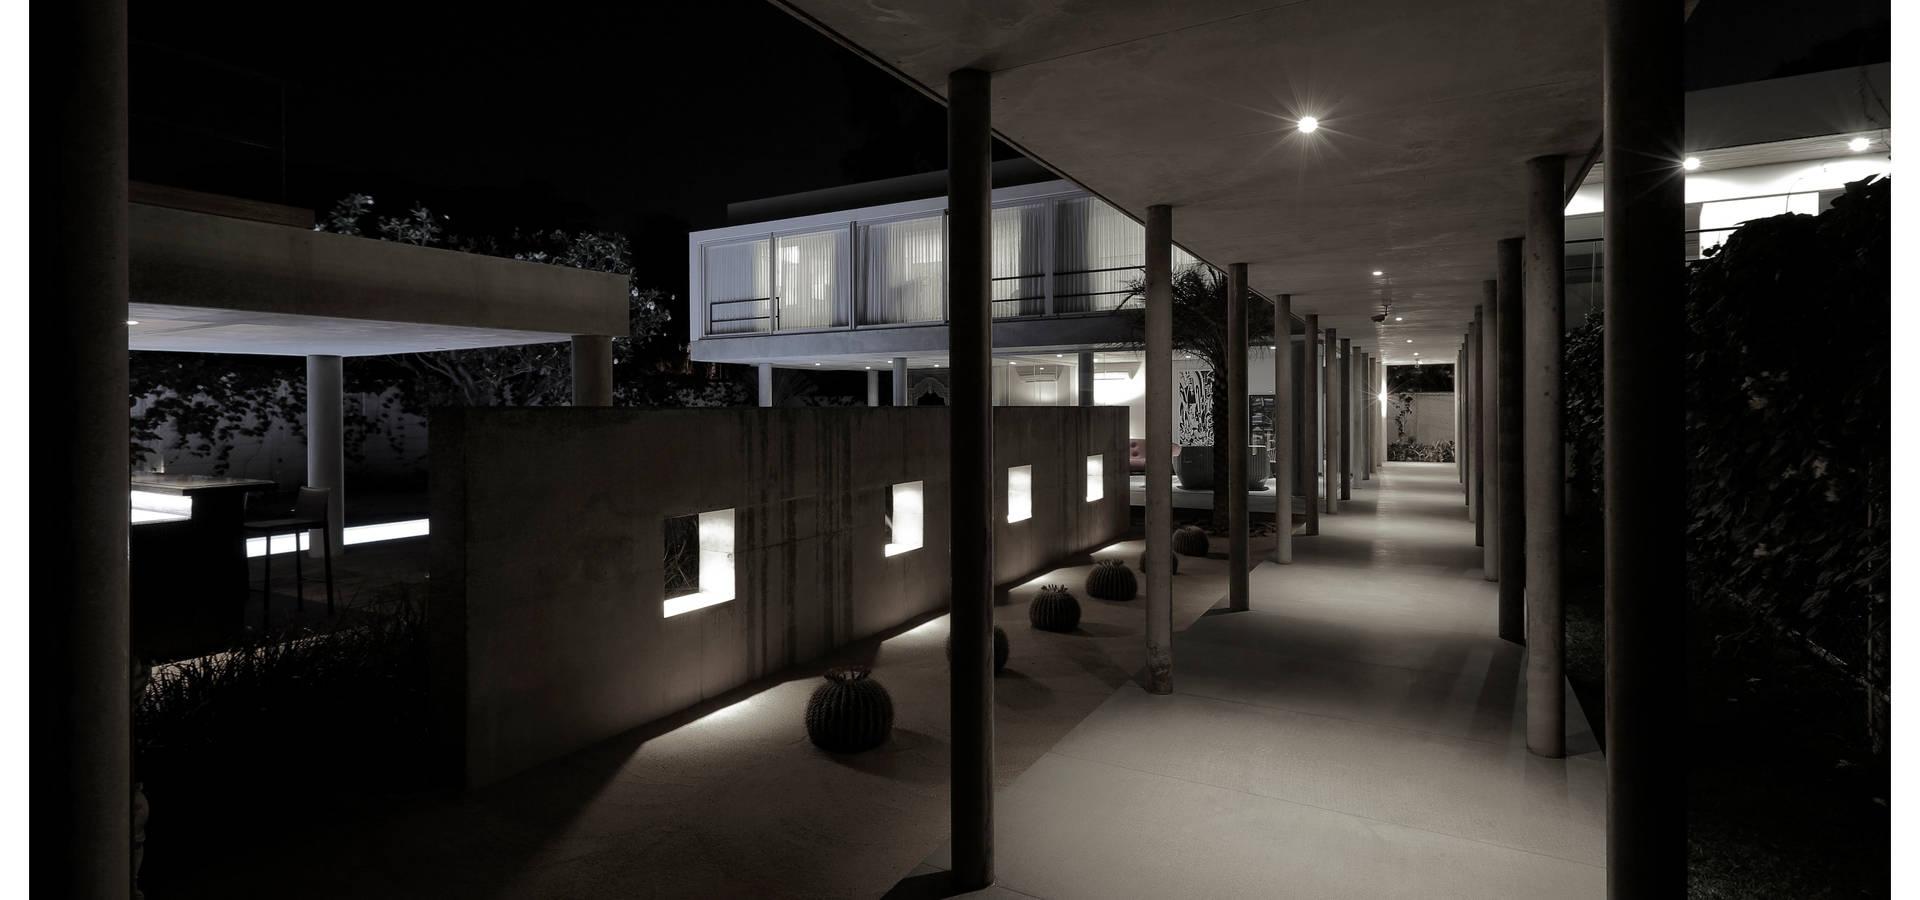 DDIR architecture studio